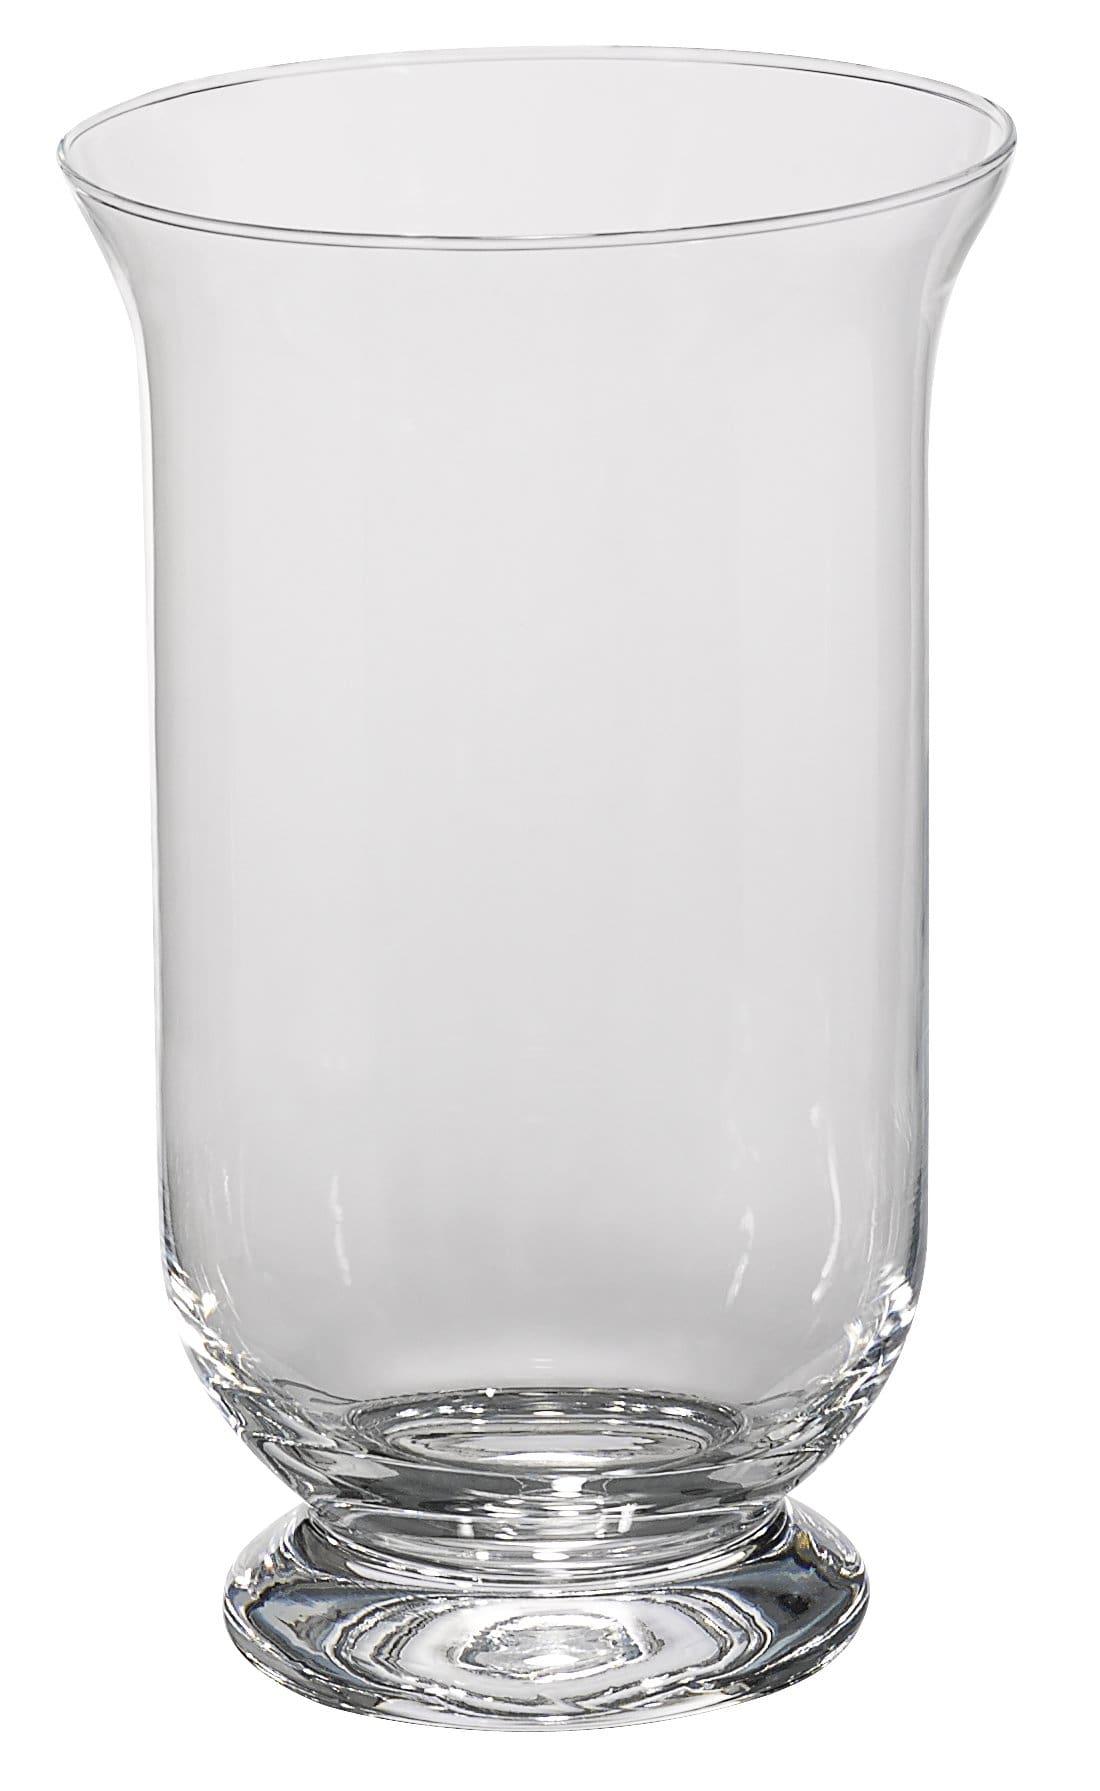 Hakbjl Glass Lanterna portalumino